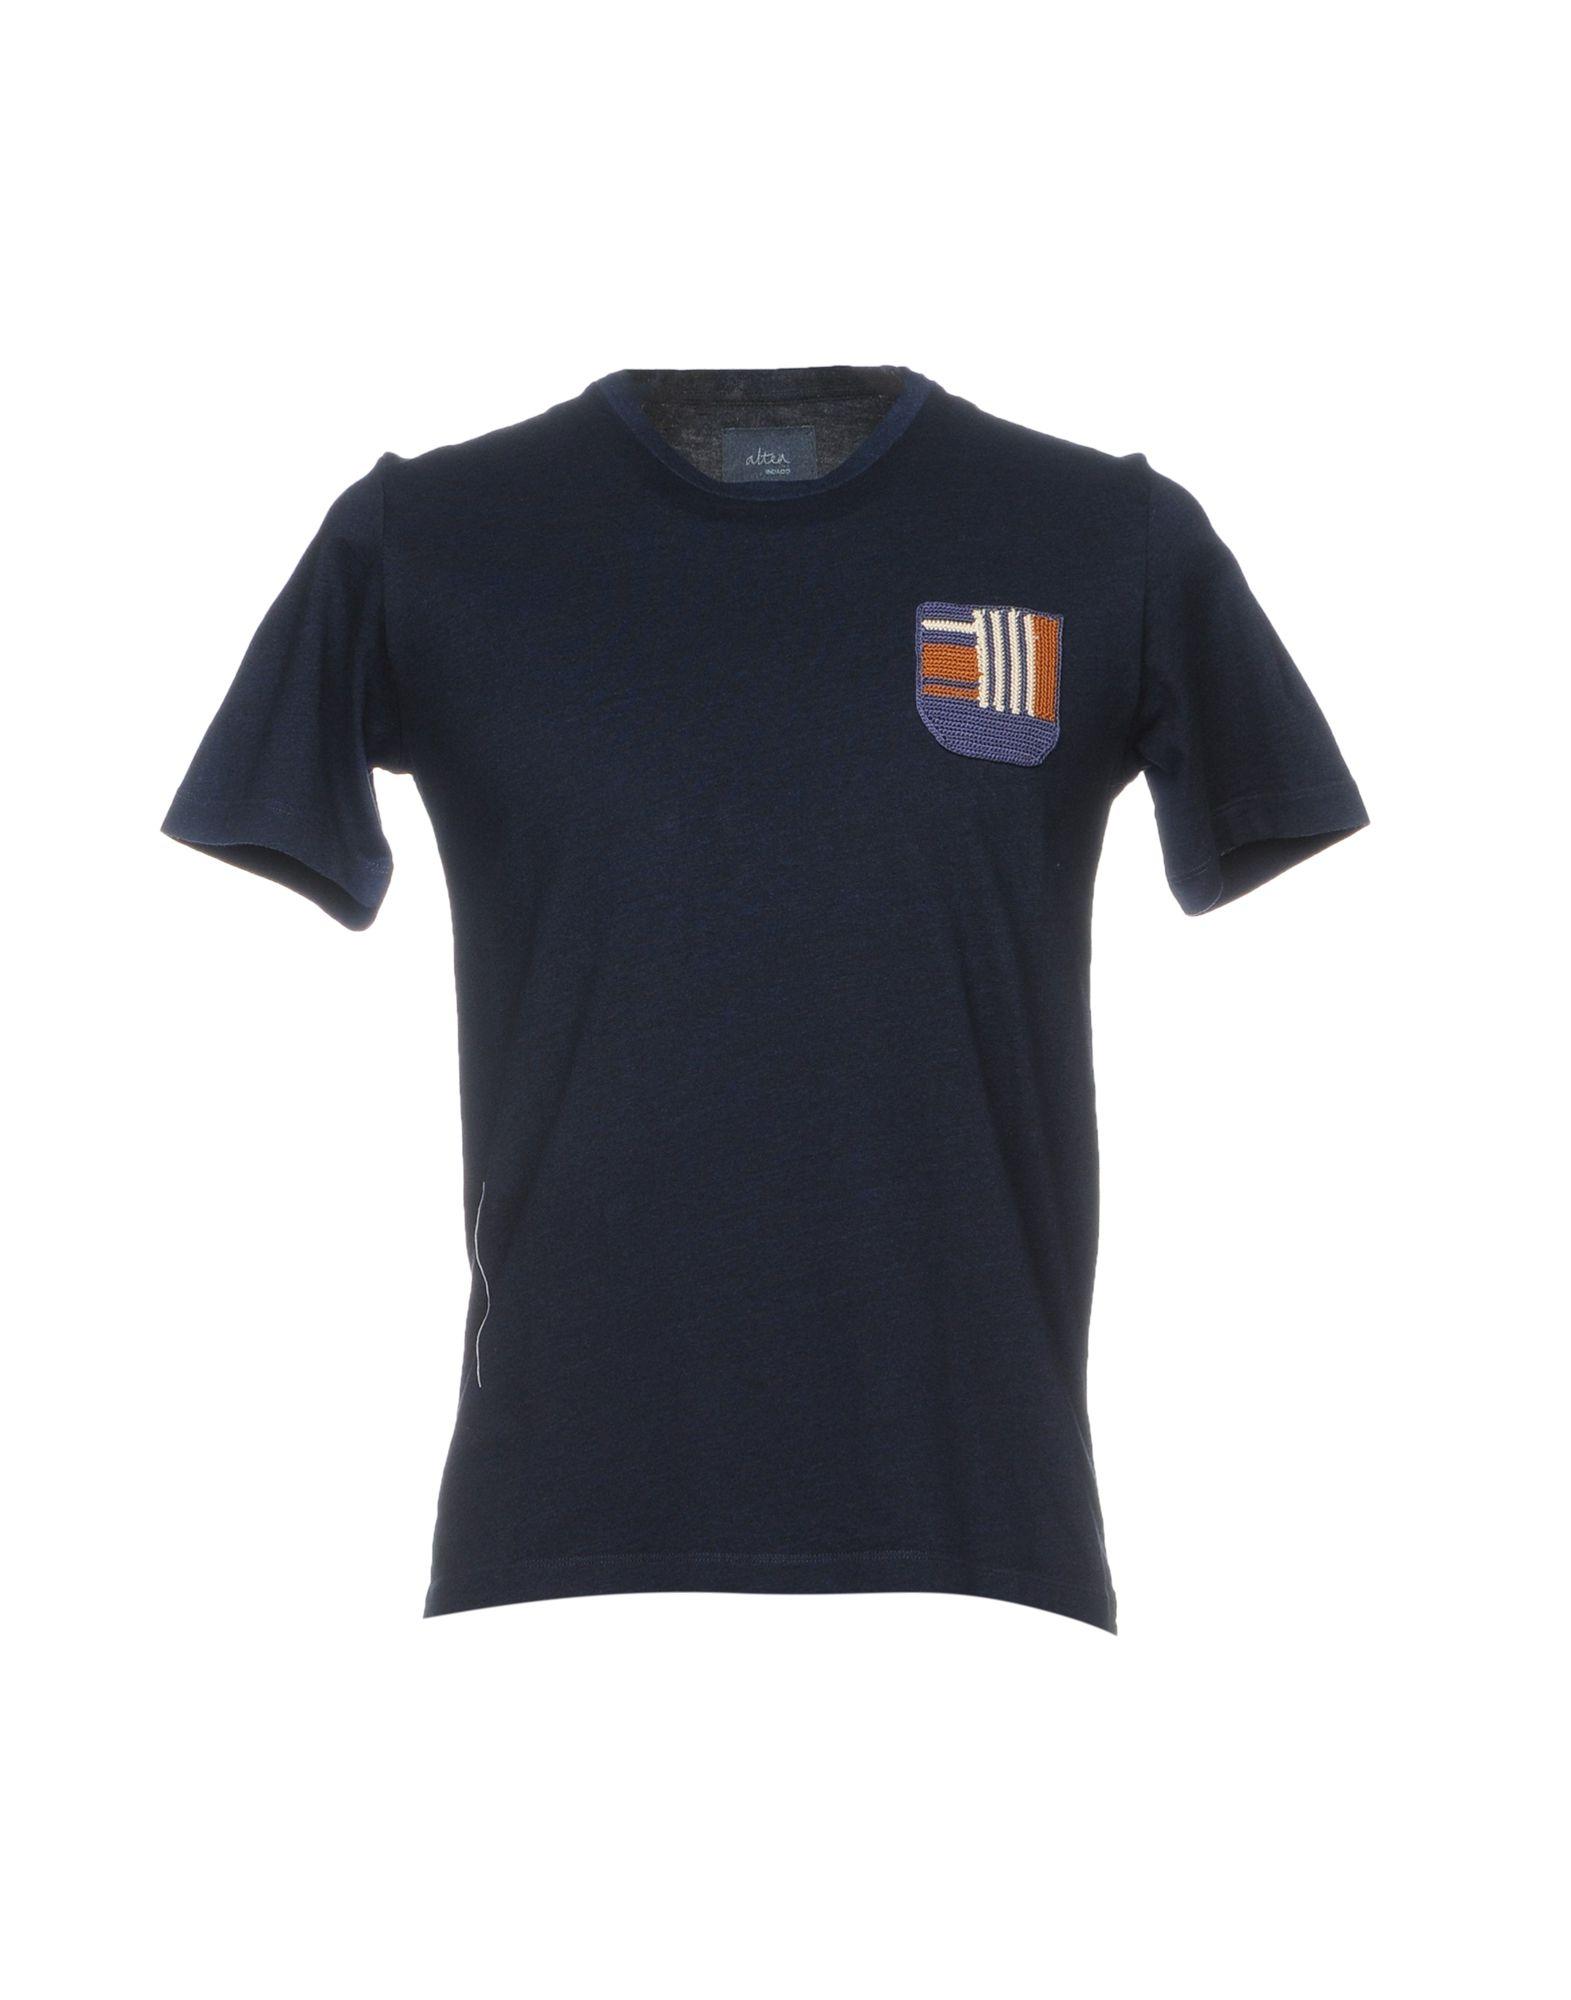 ALTEA dal 1973 Футболка altea dal 1973 джинсовая рубашка